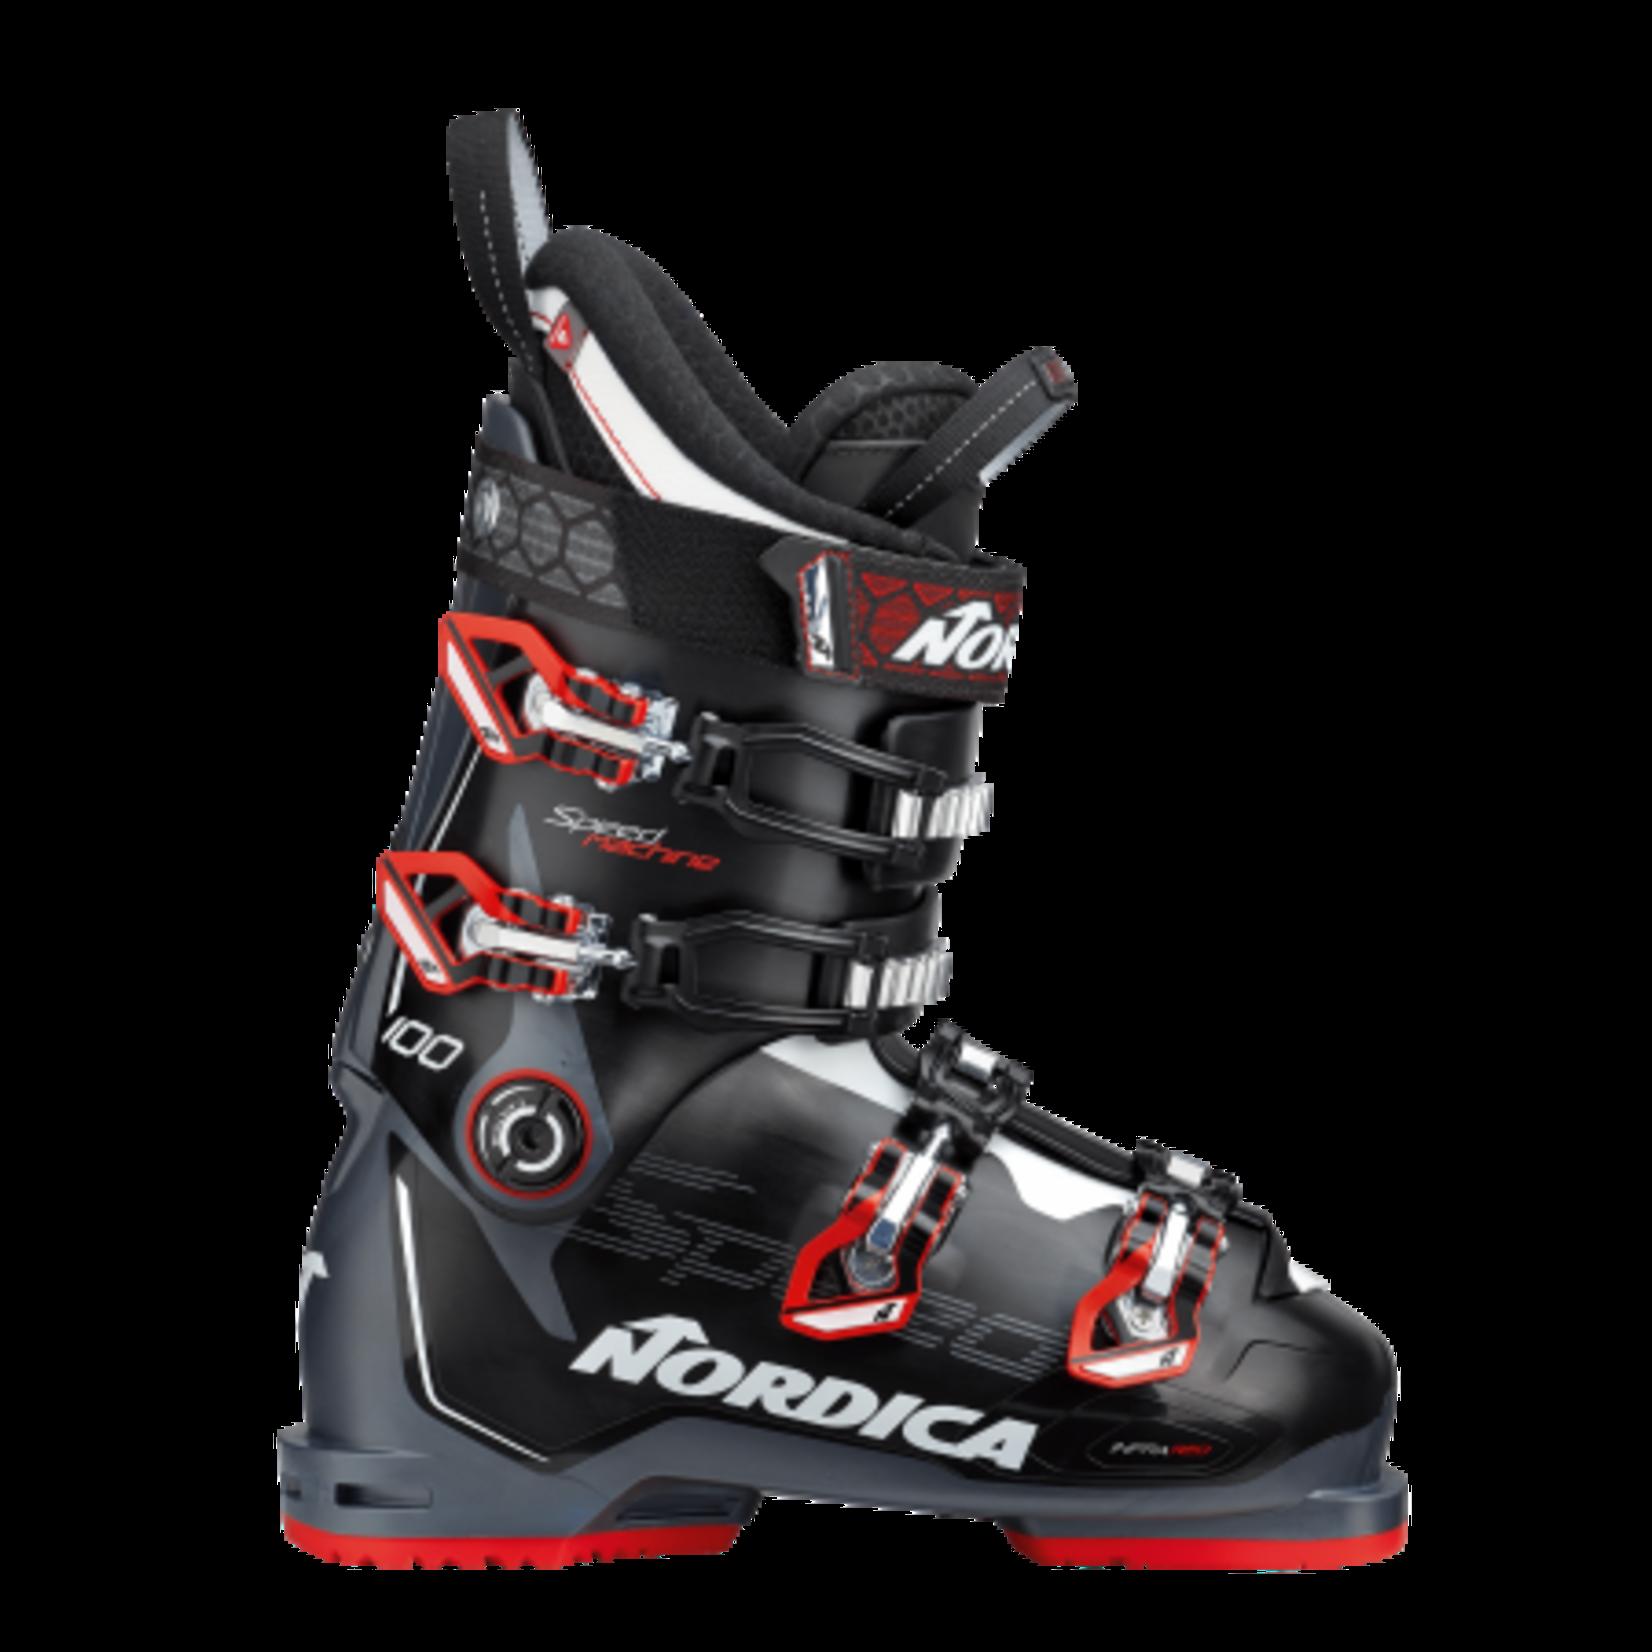 Nordica Nordica Men's Speedmachine 100 Ski Boots